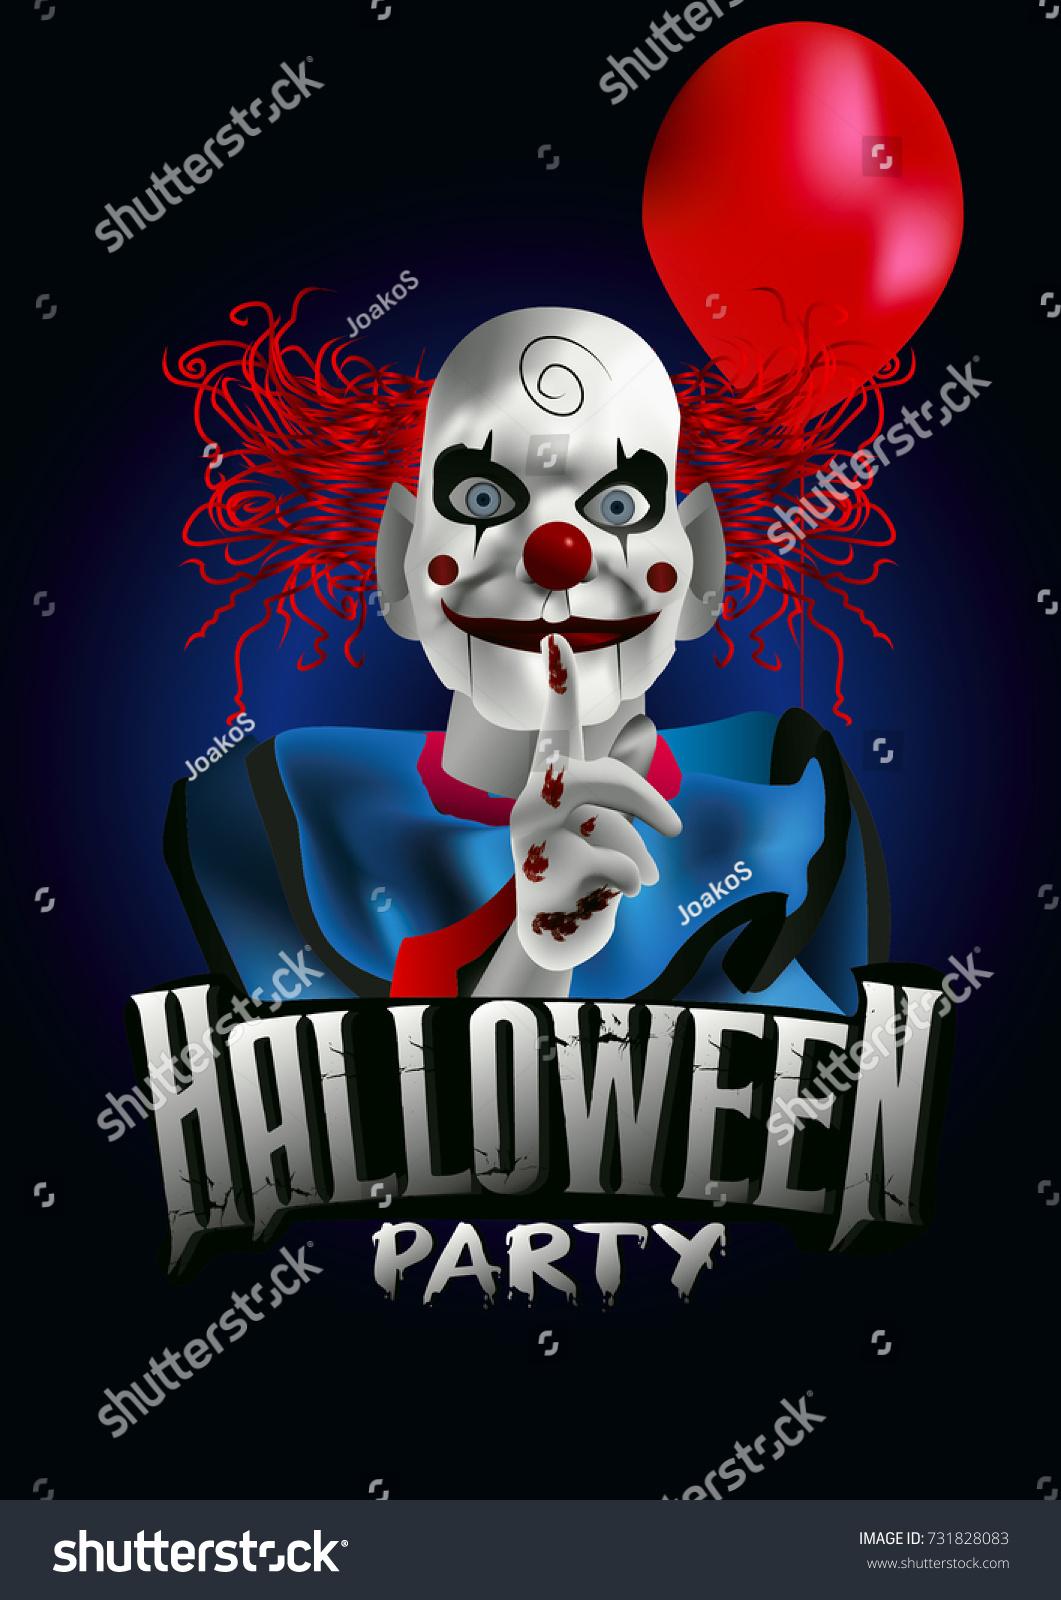 scary clown balloon halloween party flyer stock vector royalty free